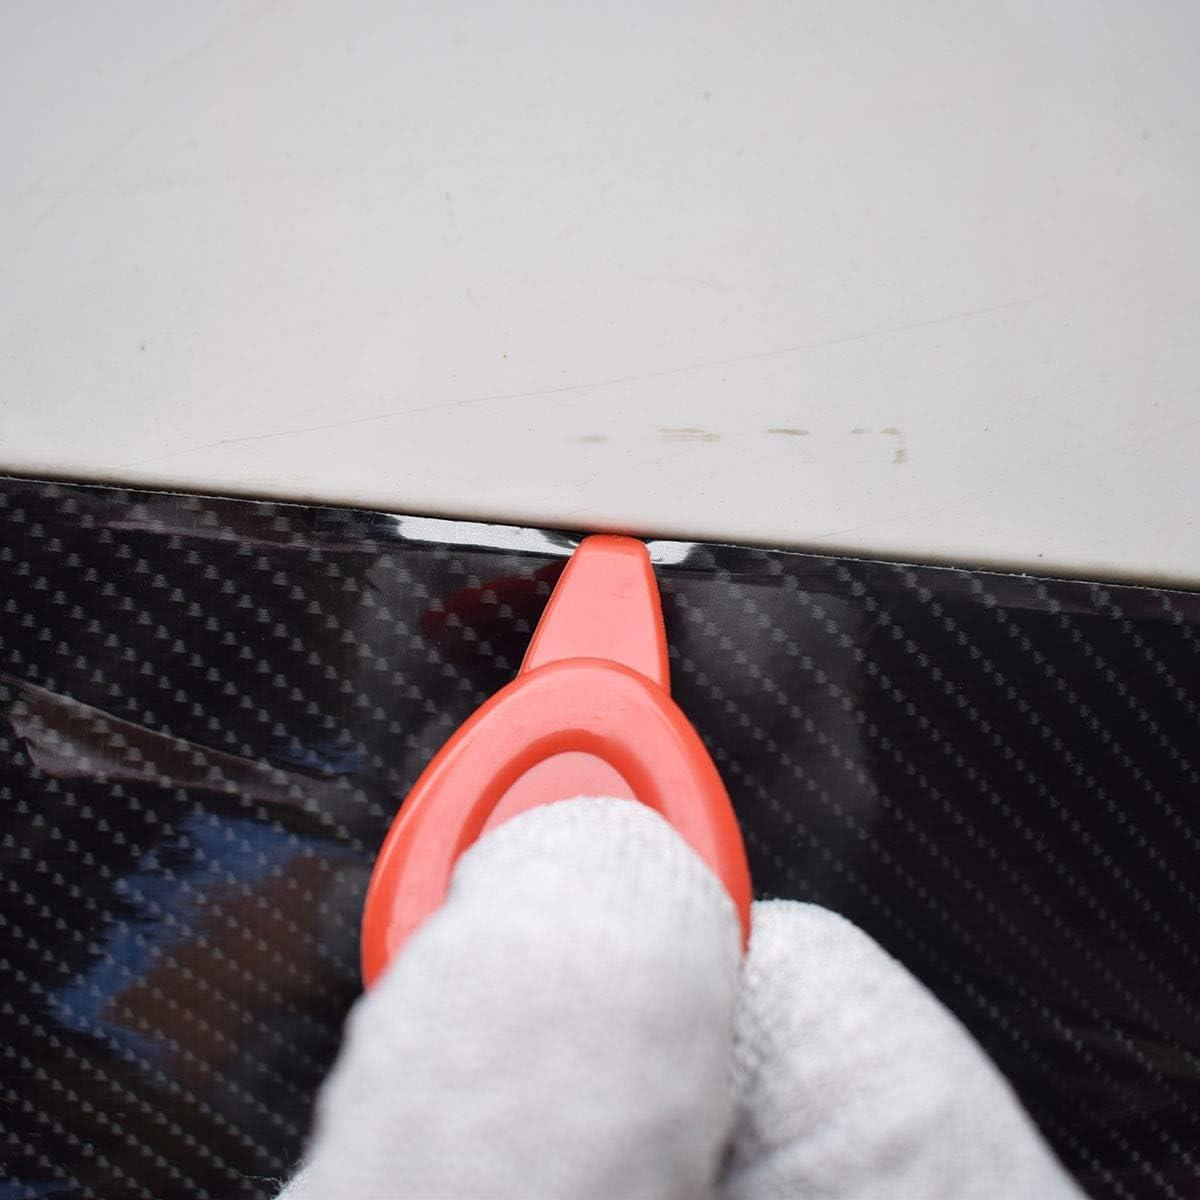 SYTASOO 3PCS Soft Car Wrap Scraper Film Corner Squeegee Professional Auto Fiber Glass Window Tint Tool Squeegee Universal Vinyl Edge Groove Curve Slot Repair Tools